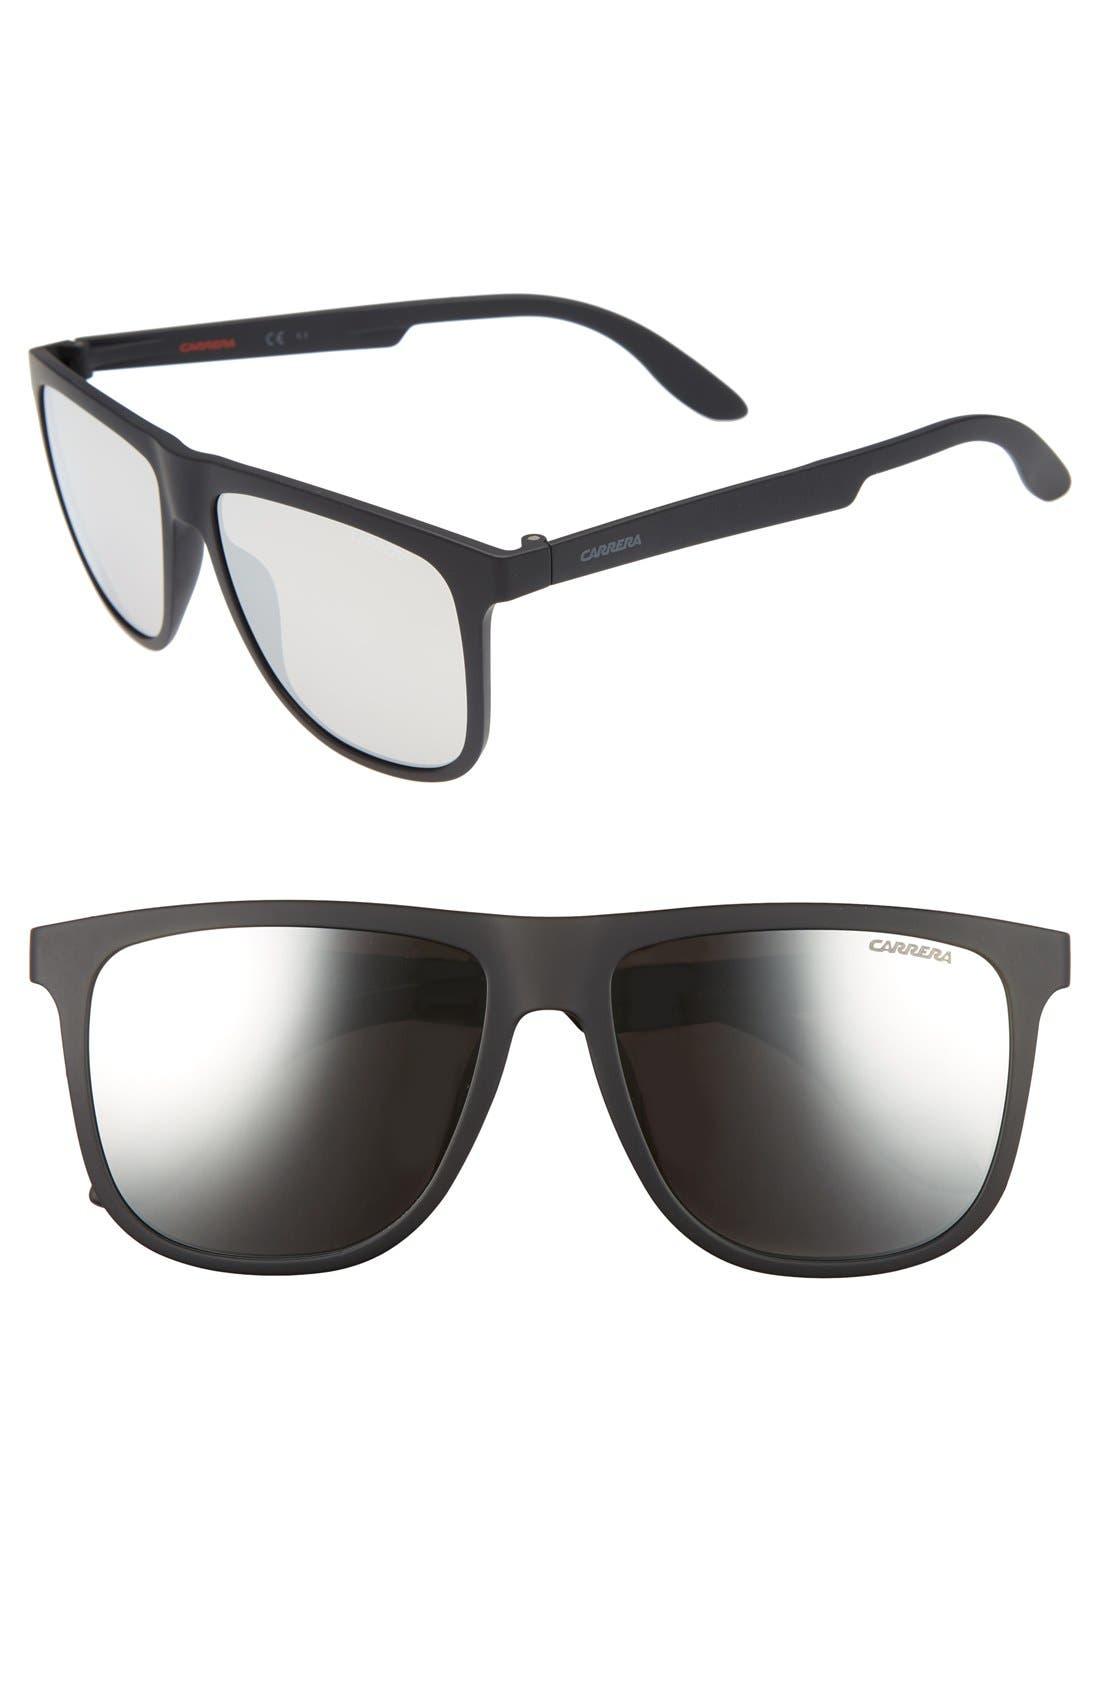 5003ST 57mm Sunglasses,                             Alternate thumbnail 3, color,                             001